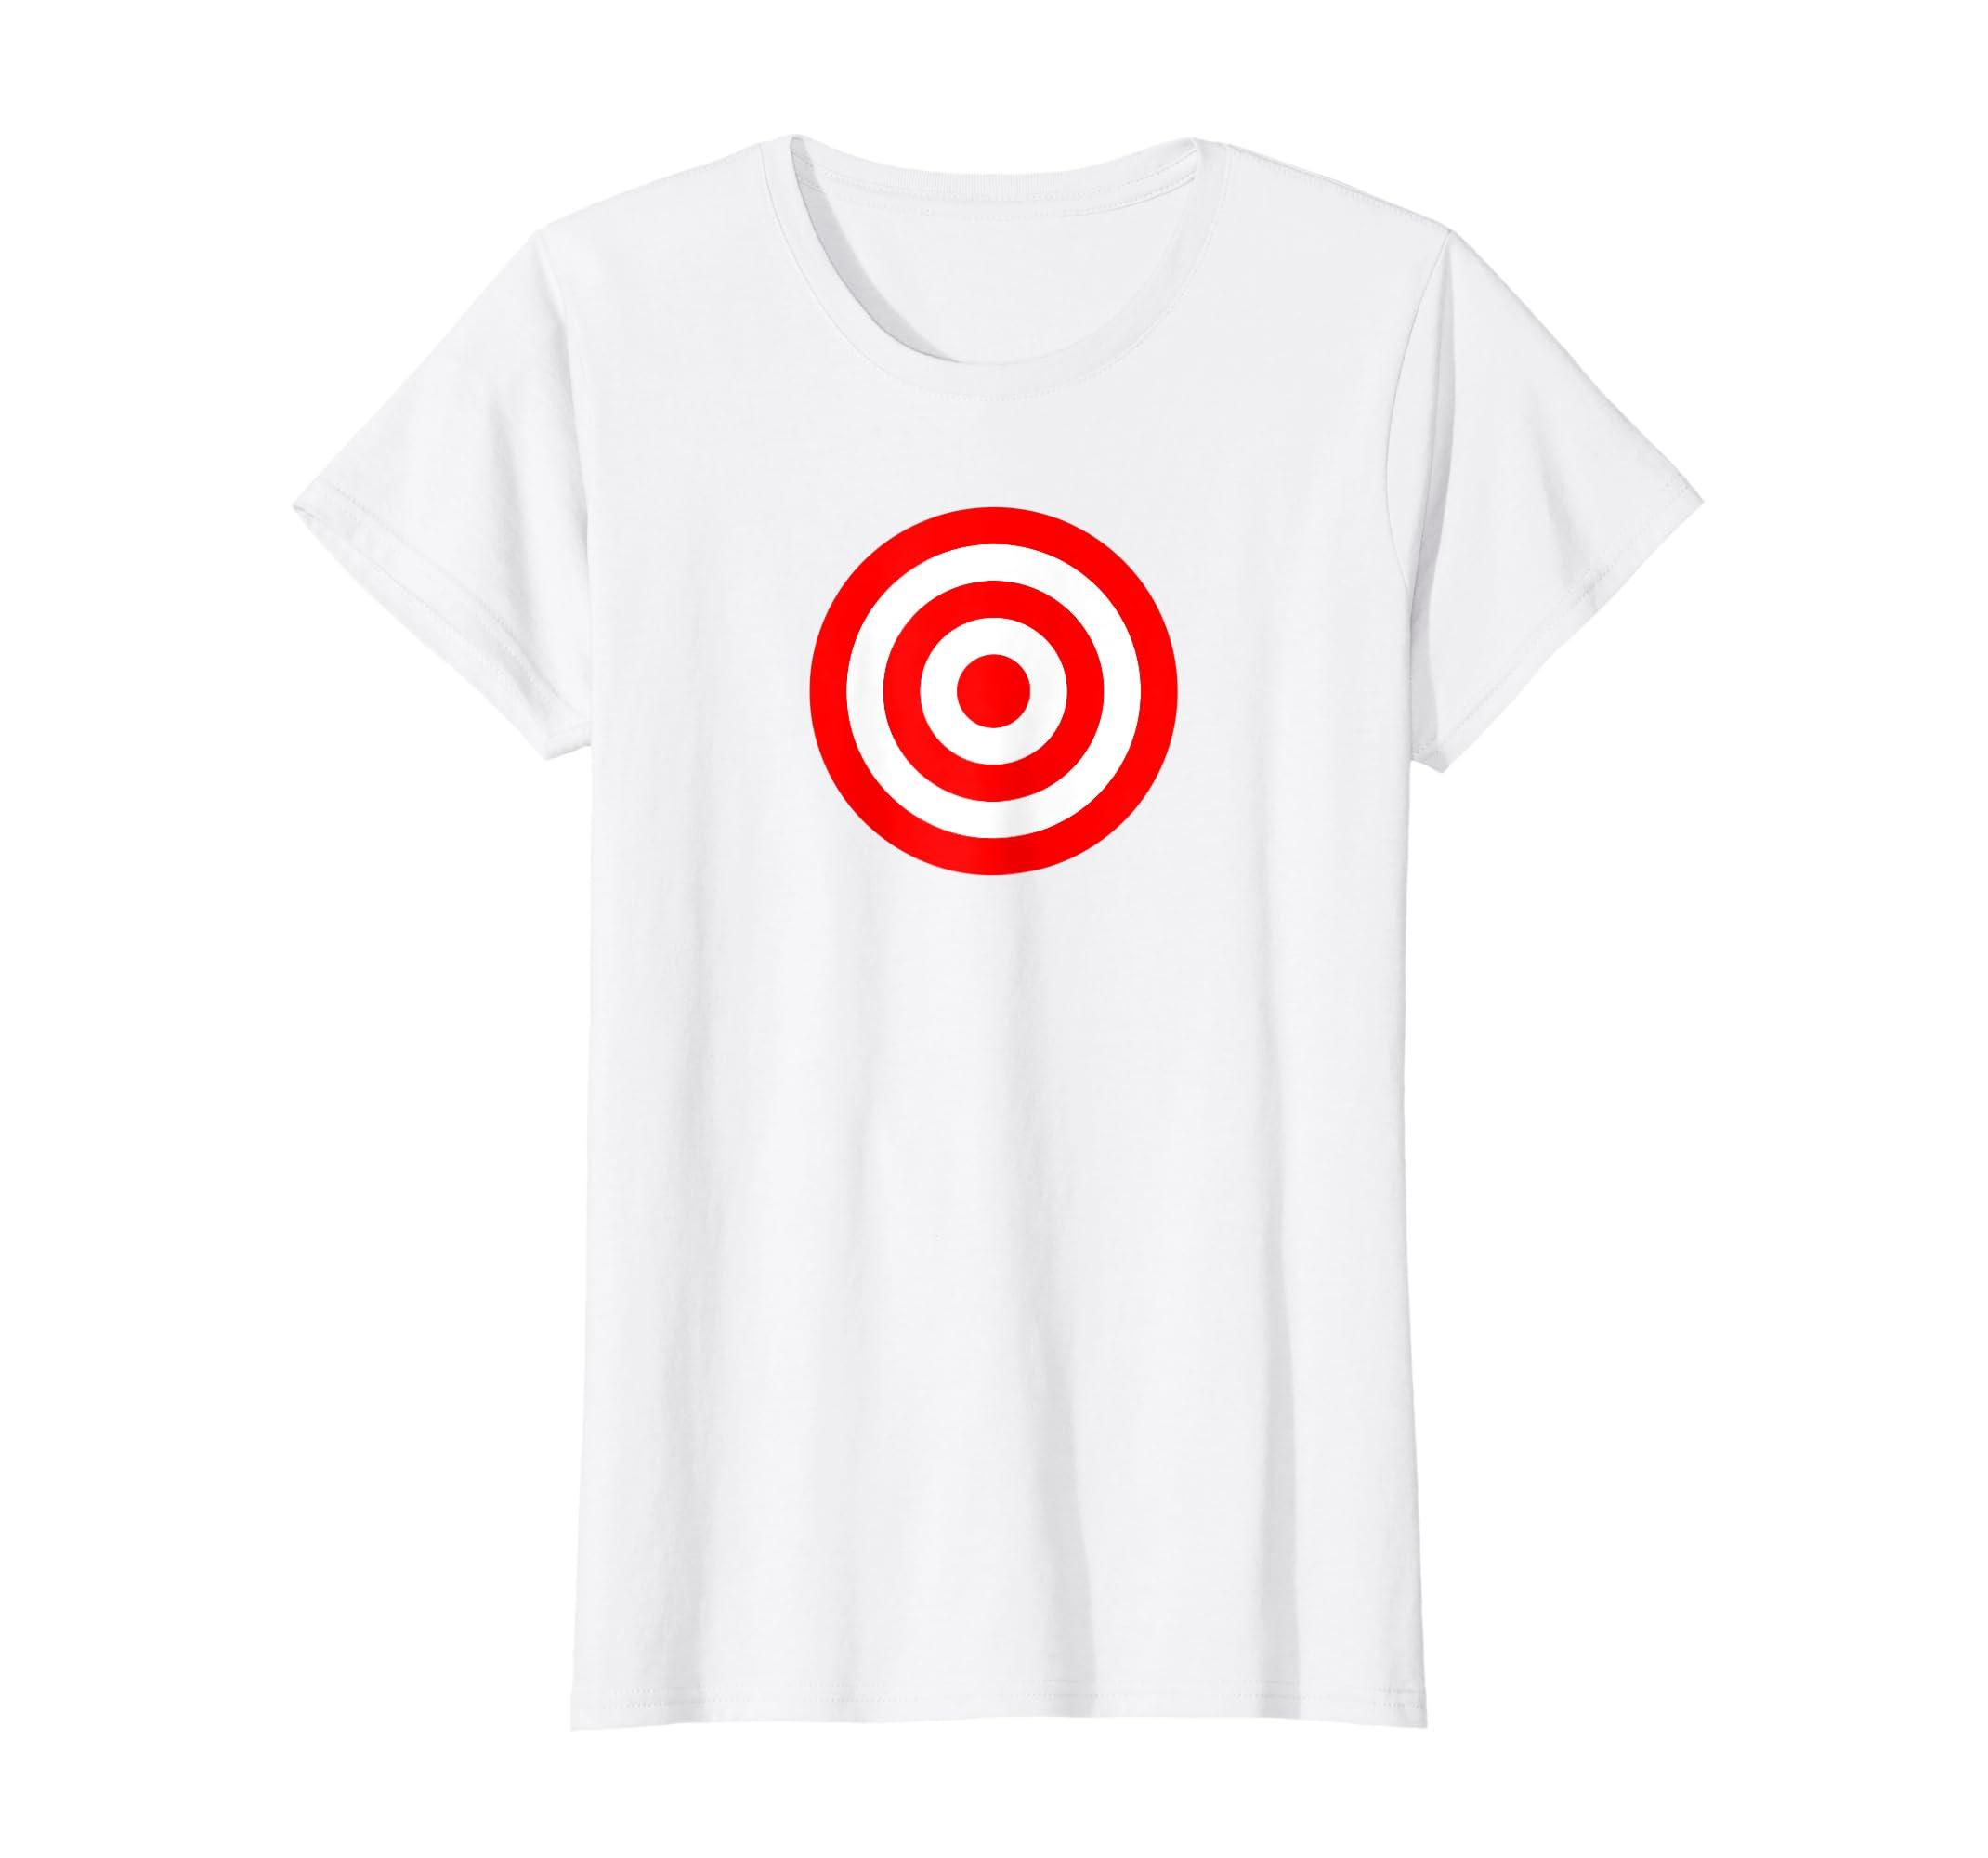 c266dc933d Amazon.com: Bullseye Red & White Shooting Rings Target Funny Tee Shirt:  Clothing